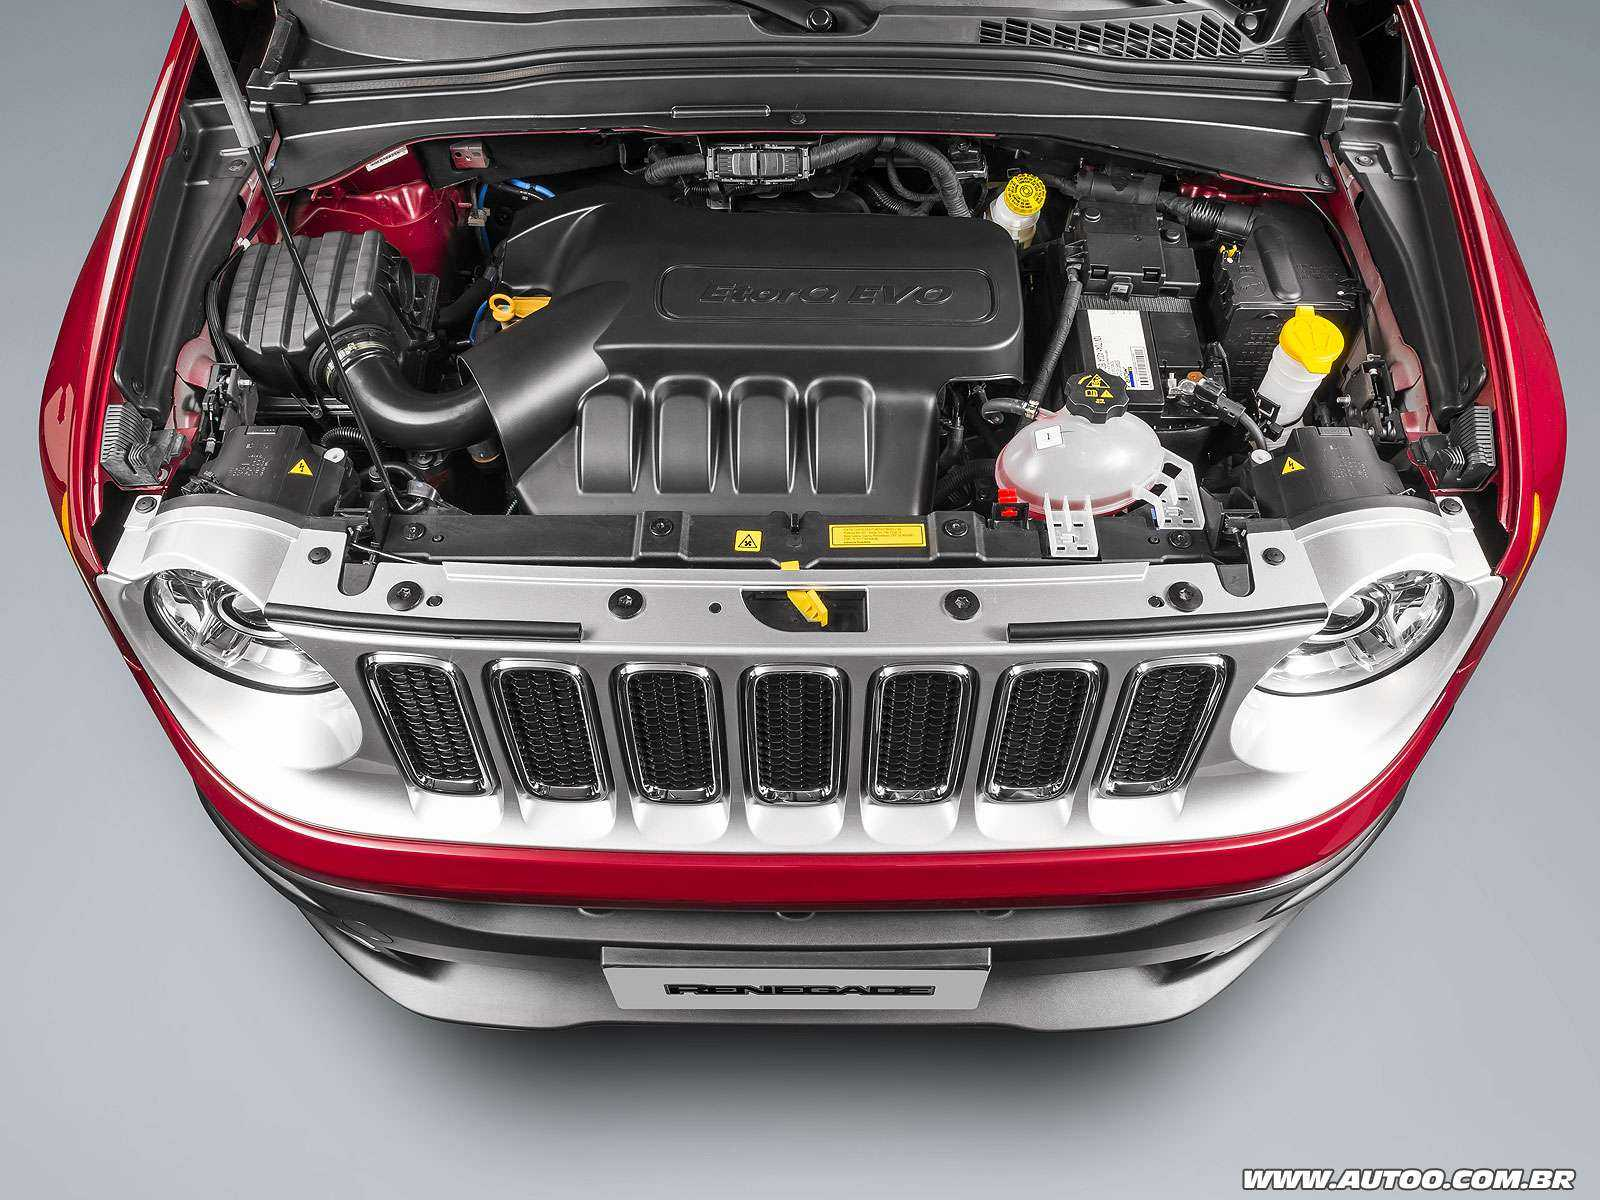 JeepRenegade 2017 - motor